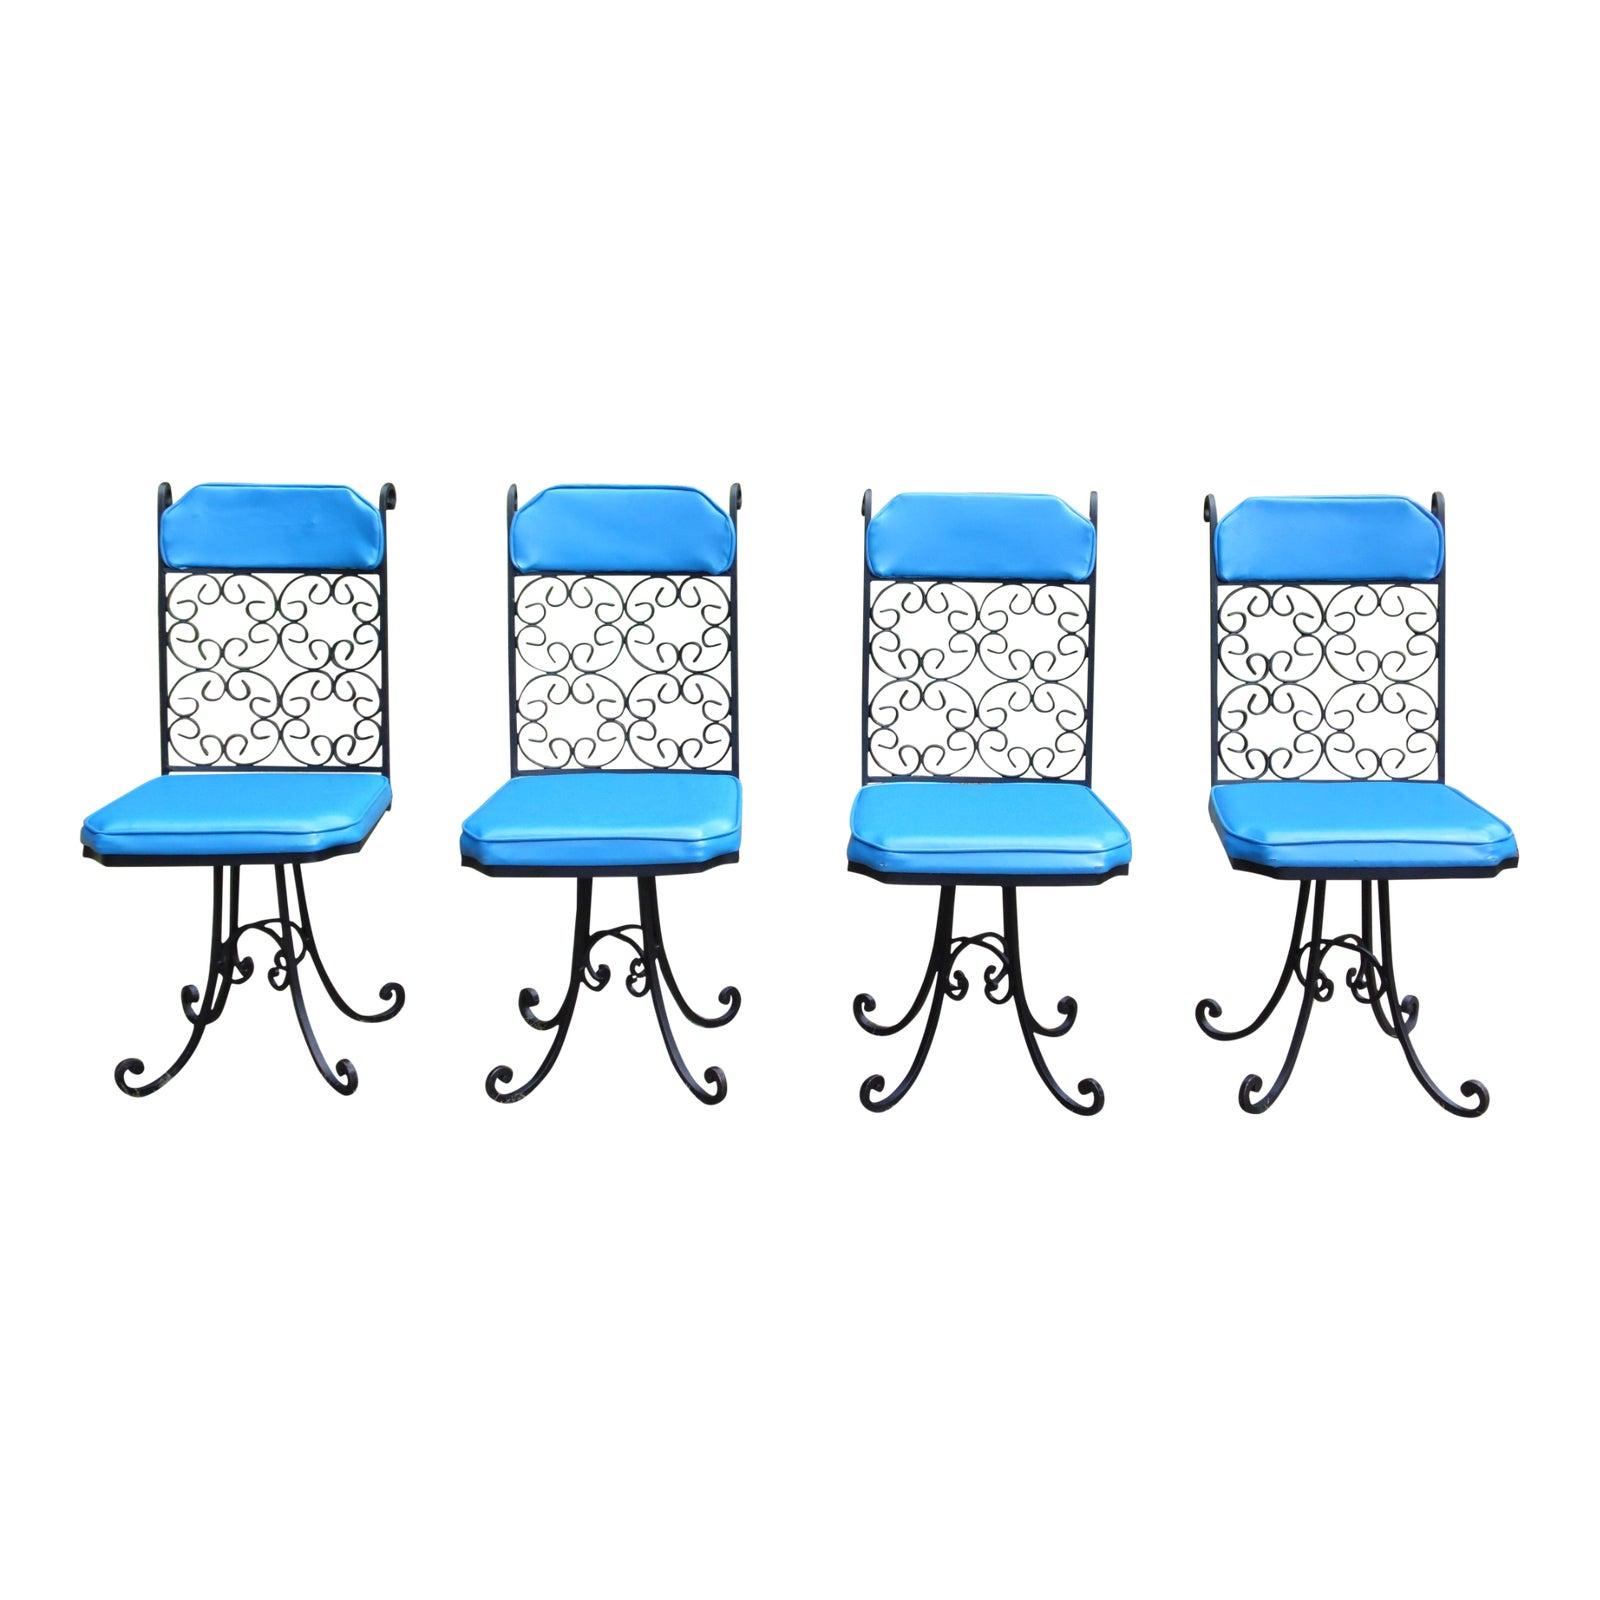 Vintage Set Of 4 Mid Century Modern Antarenni Wrought Iron Patio Dining Chairs